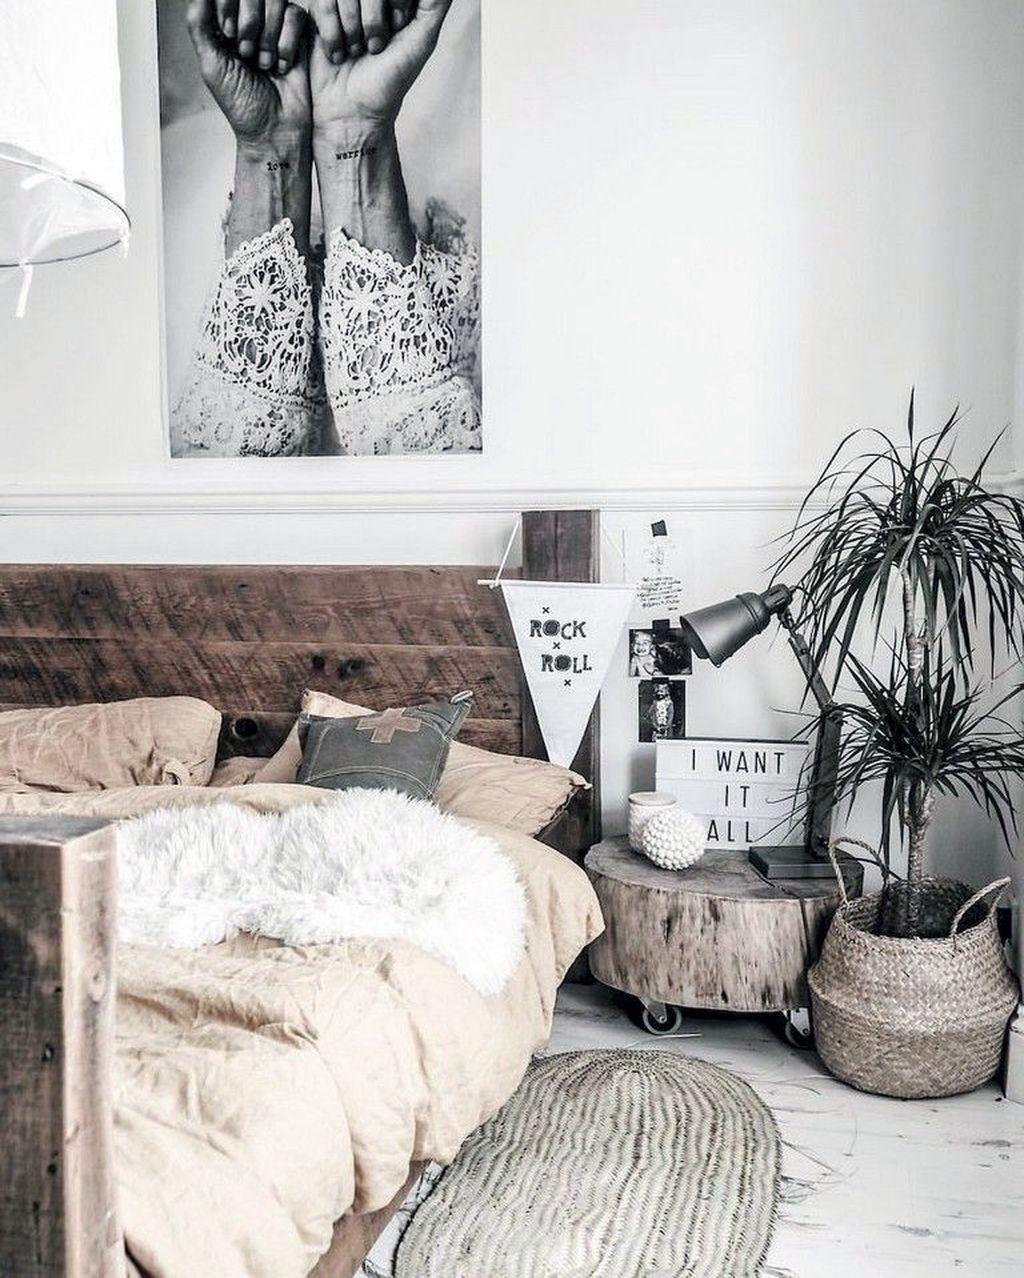 31 Magnificent Rustic Scandinavian Interior Bedroom Inspirations In 2020 Scandinavian Interior Bedroom Scandinavian Design Bedroom Rustic Bedroom Decor